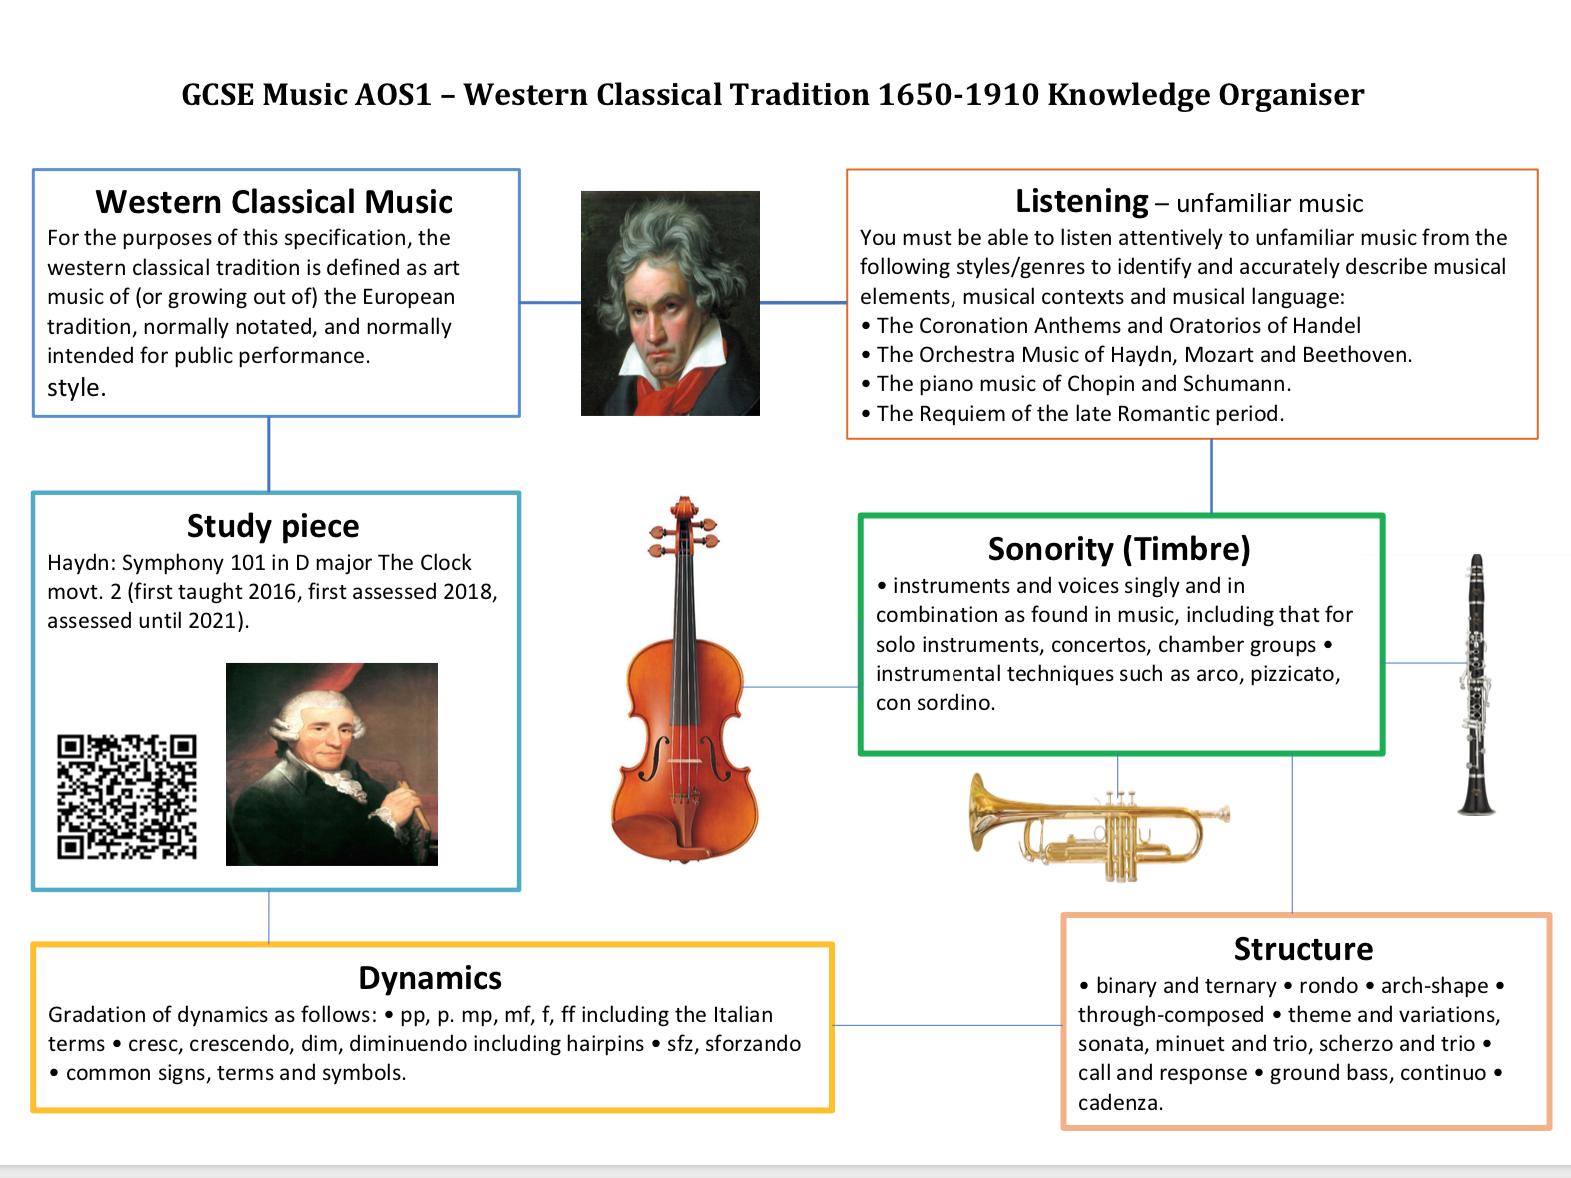 AQA GCSE Music knowledge organisers